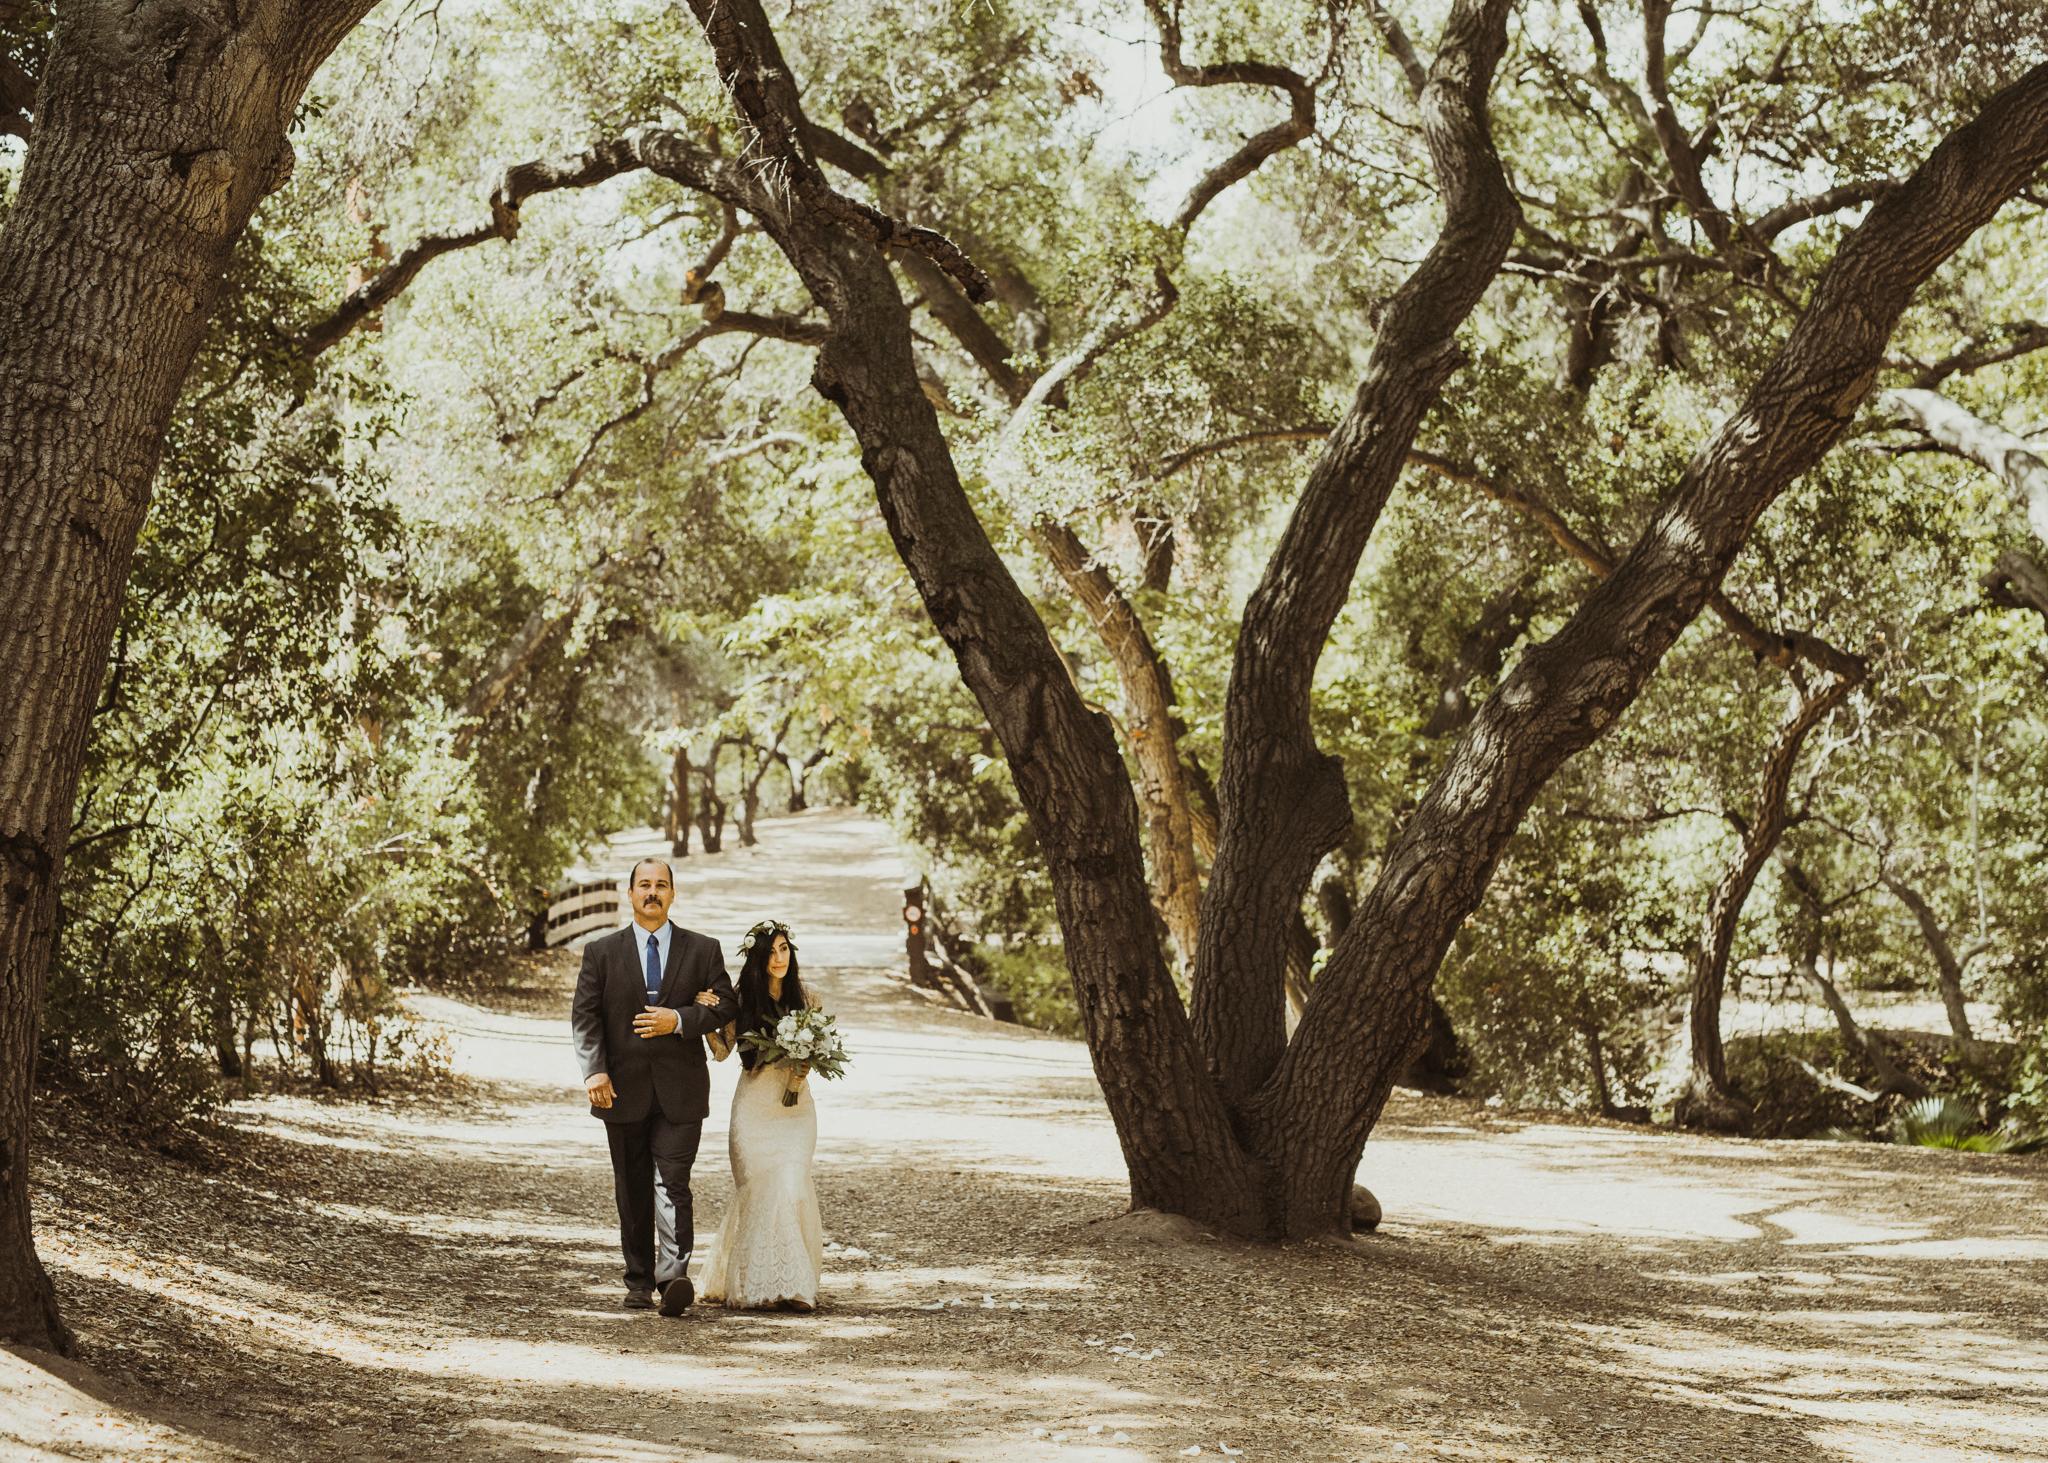 ©Isaiah-&-Taylor-Photography---Oak-Canyon-Nature-Center-Wedding,-Anaheim-Hills-040.jpg